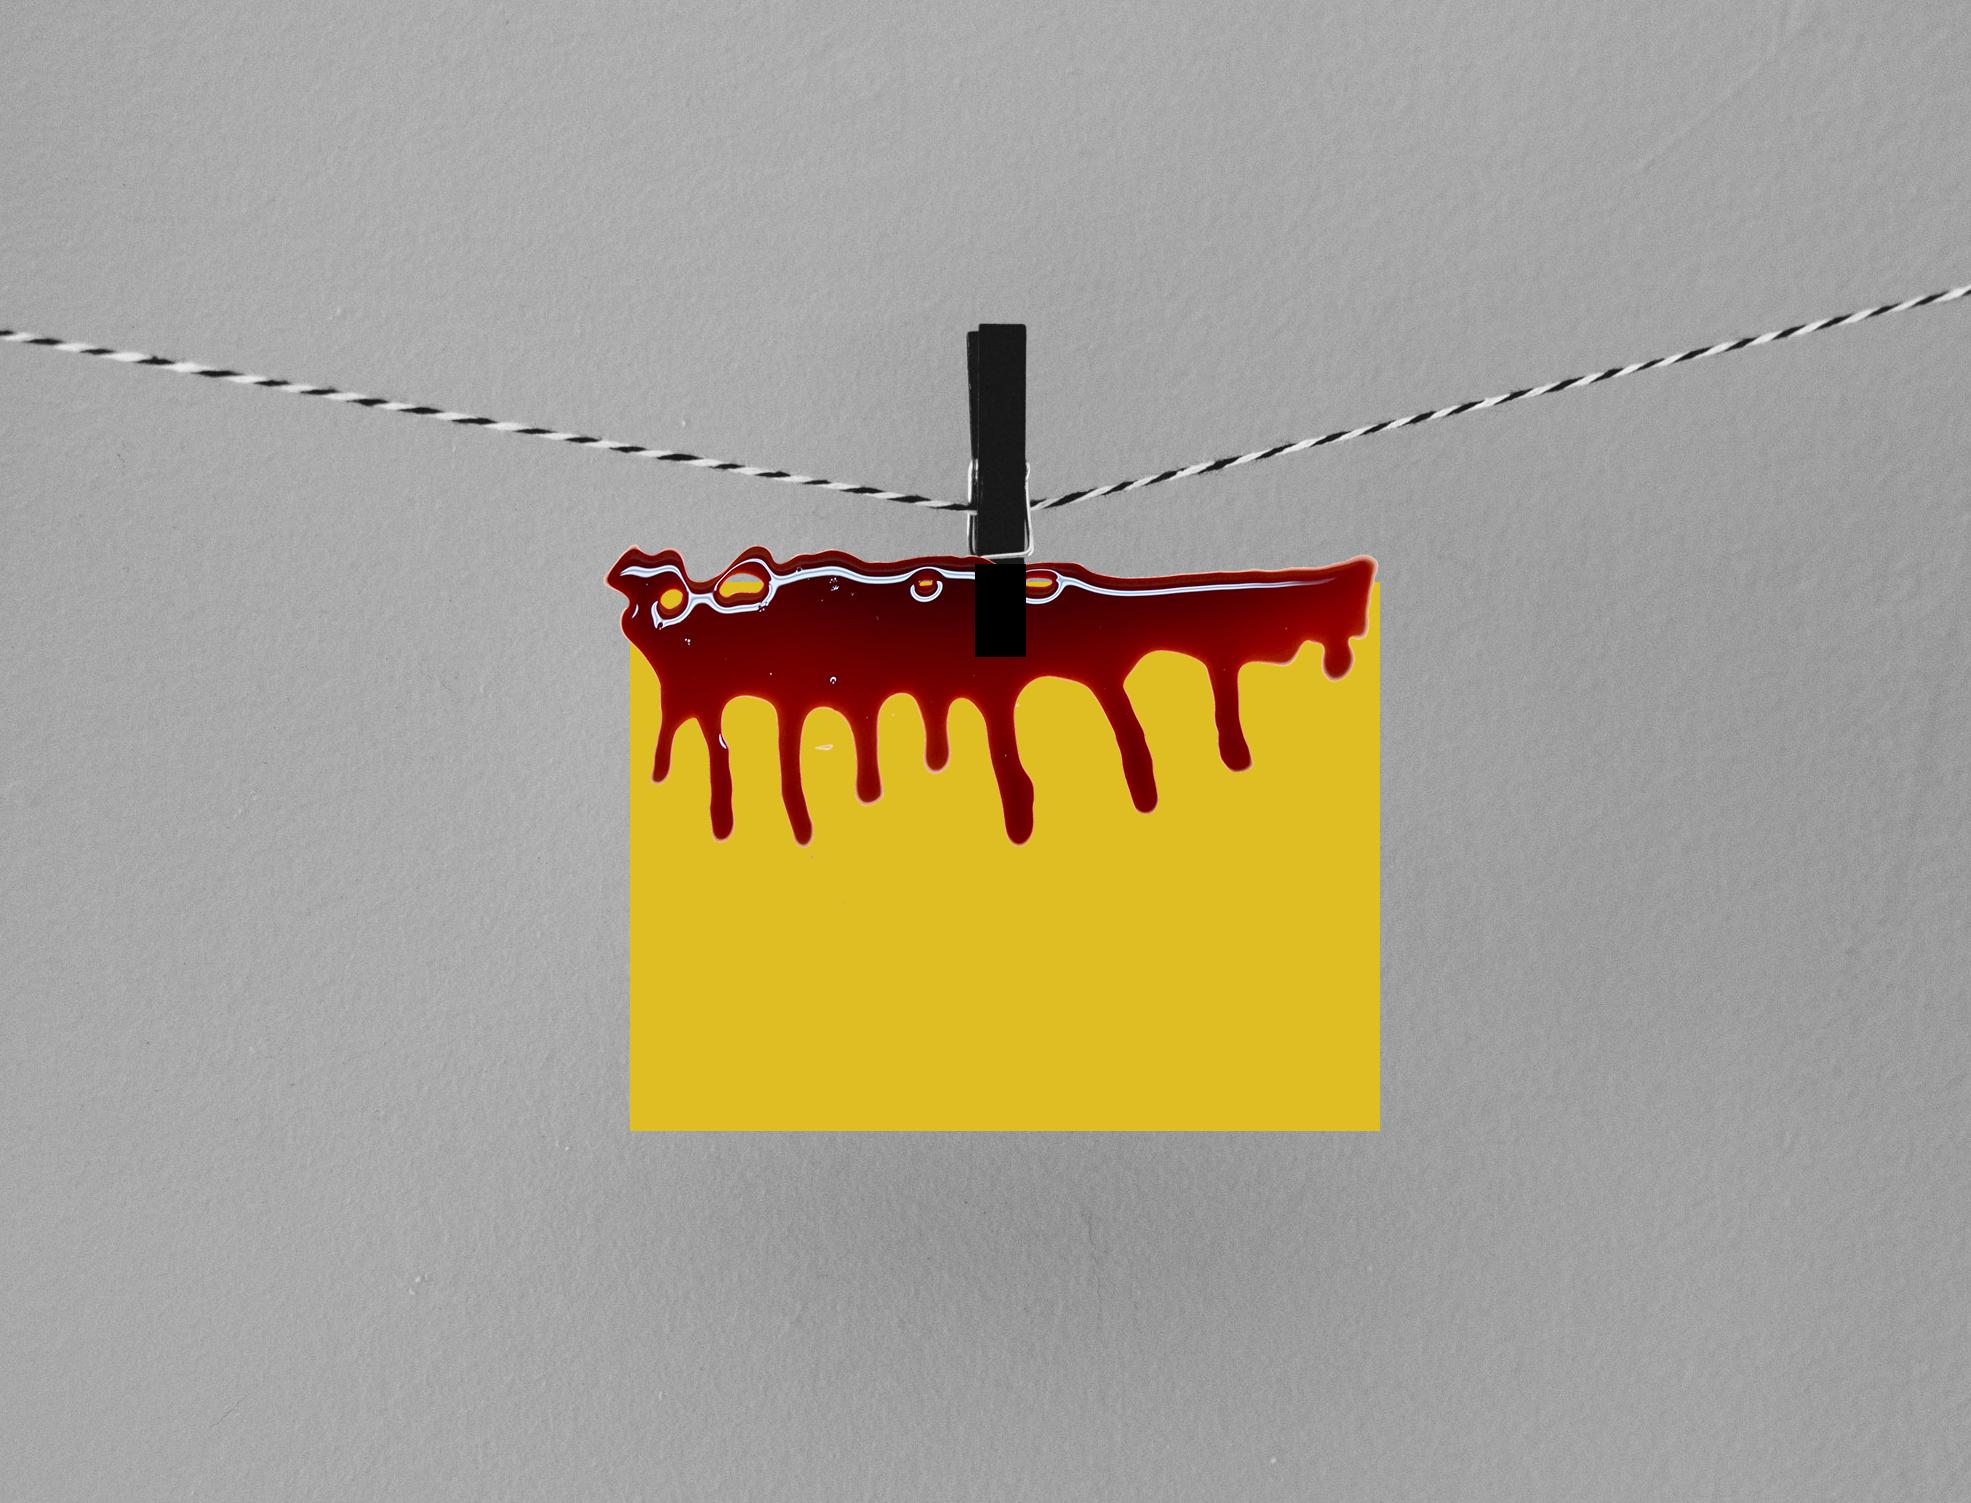 Bleeding Goldenrod Paper - Halloween Science Project